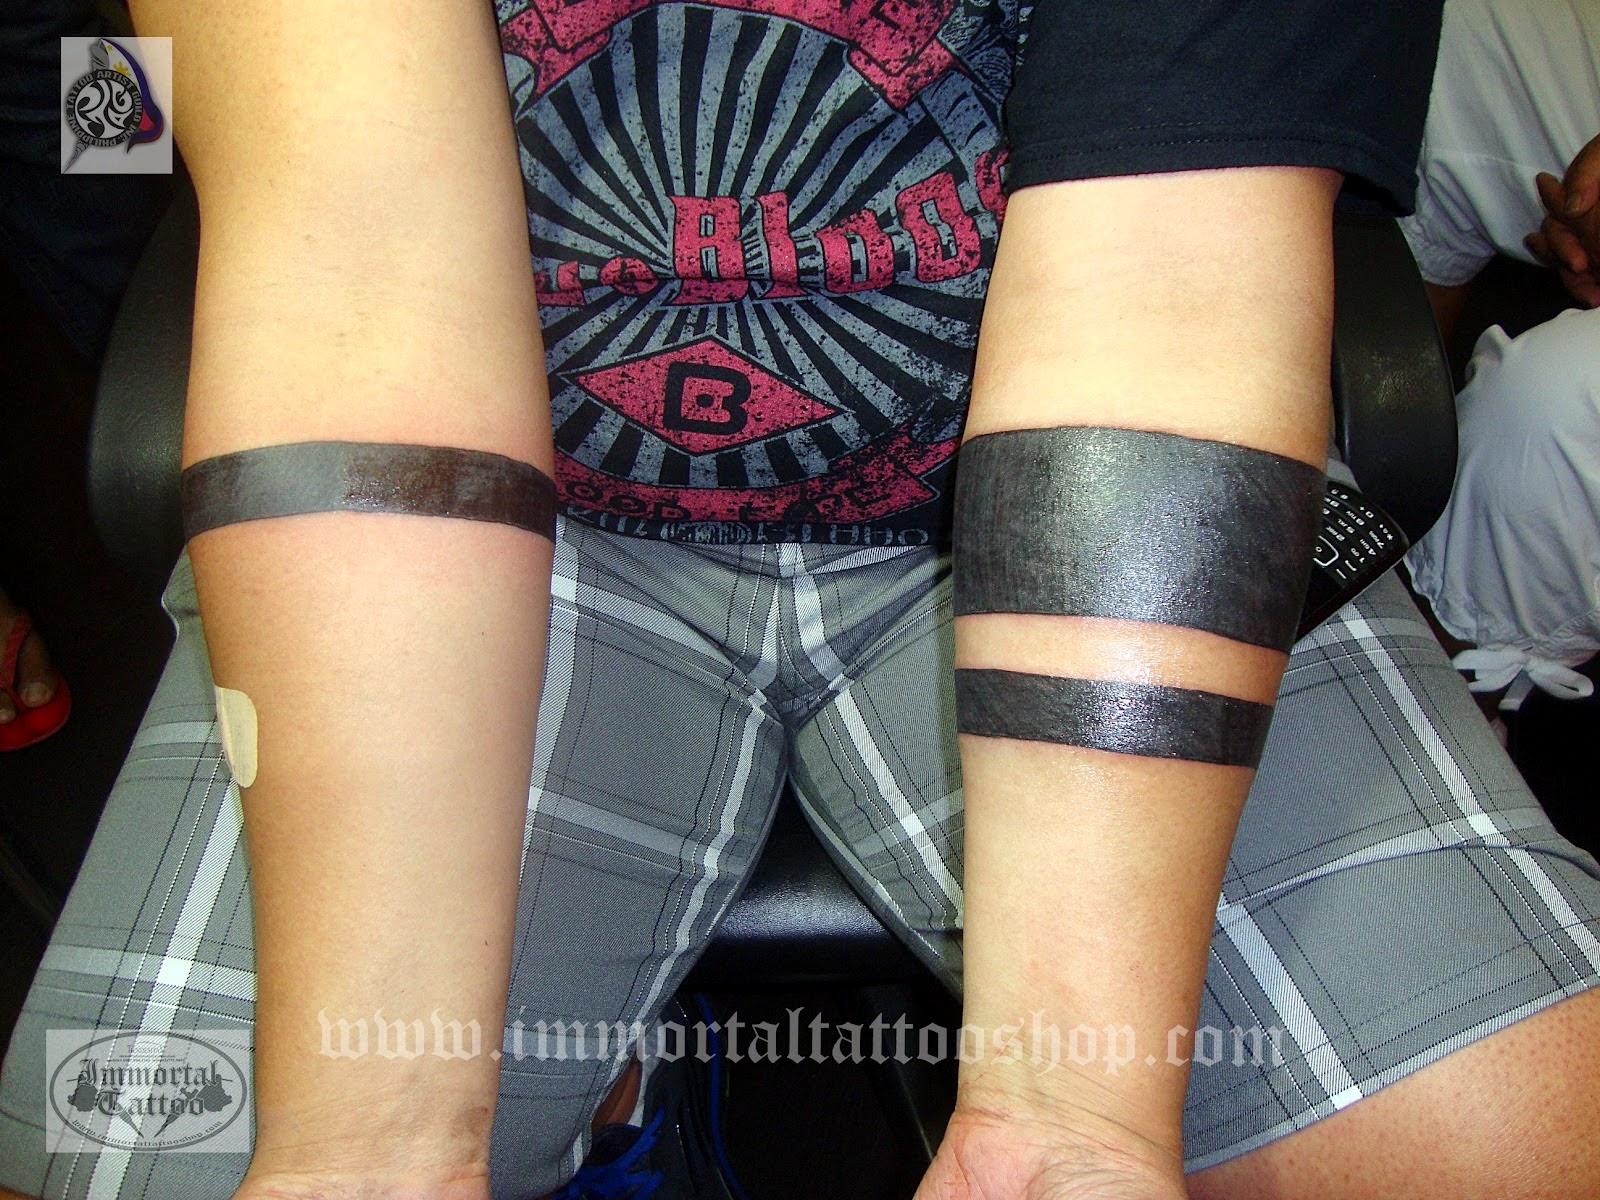 lower back tattoo designs: Maret 2015